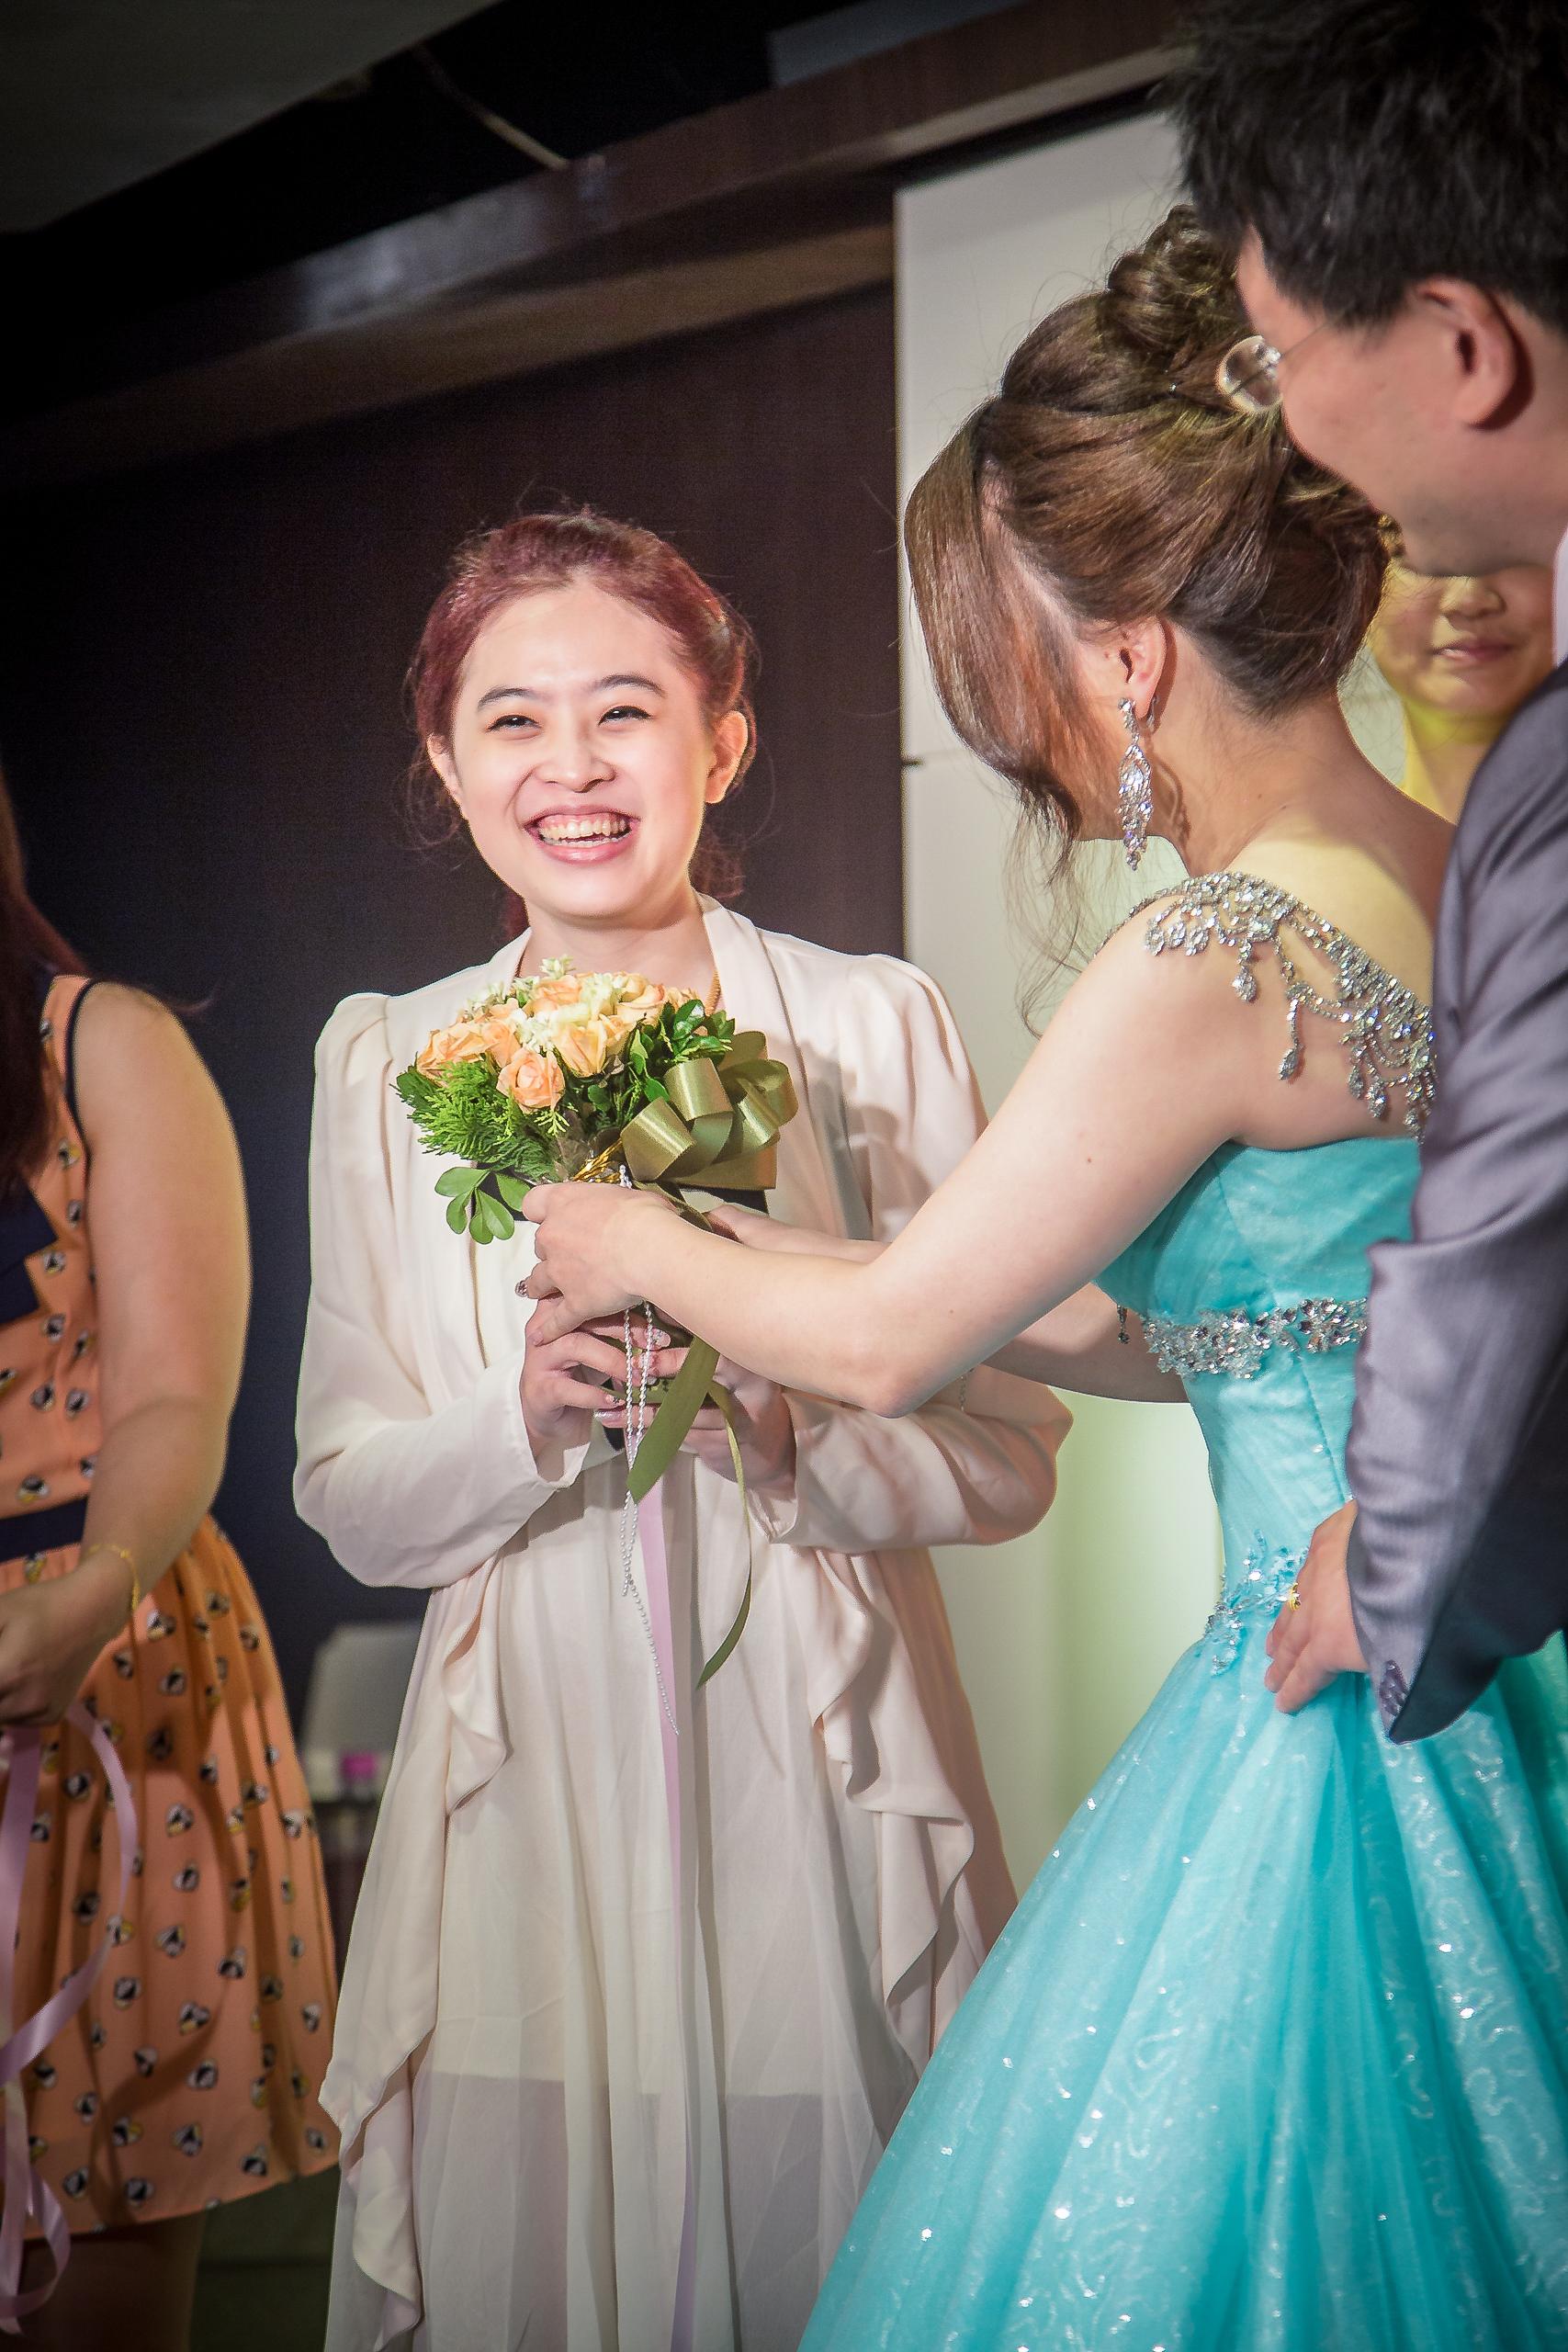 Wedding-婚攝Q比-酷比攝影-CUBY-PHOTOGRAPHY-台北僑園飯店-19